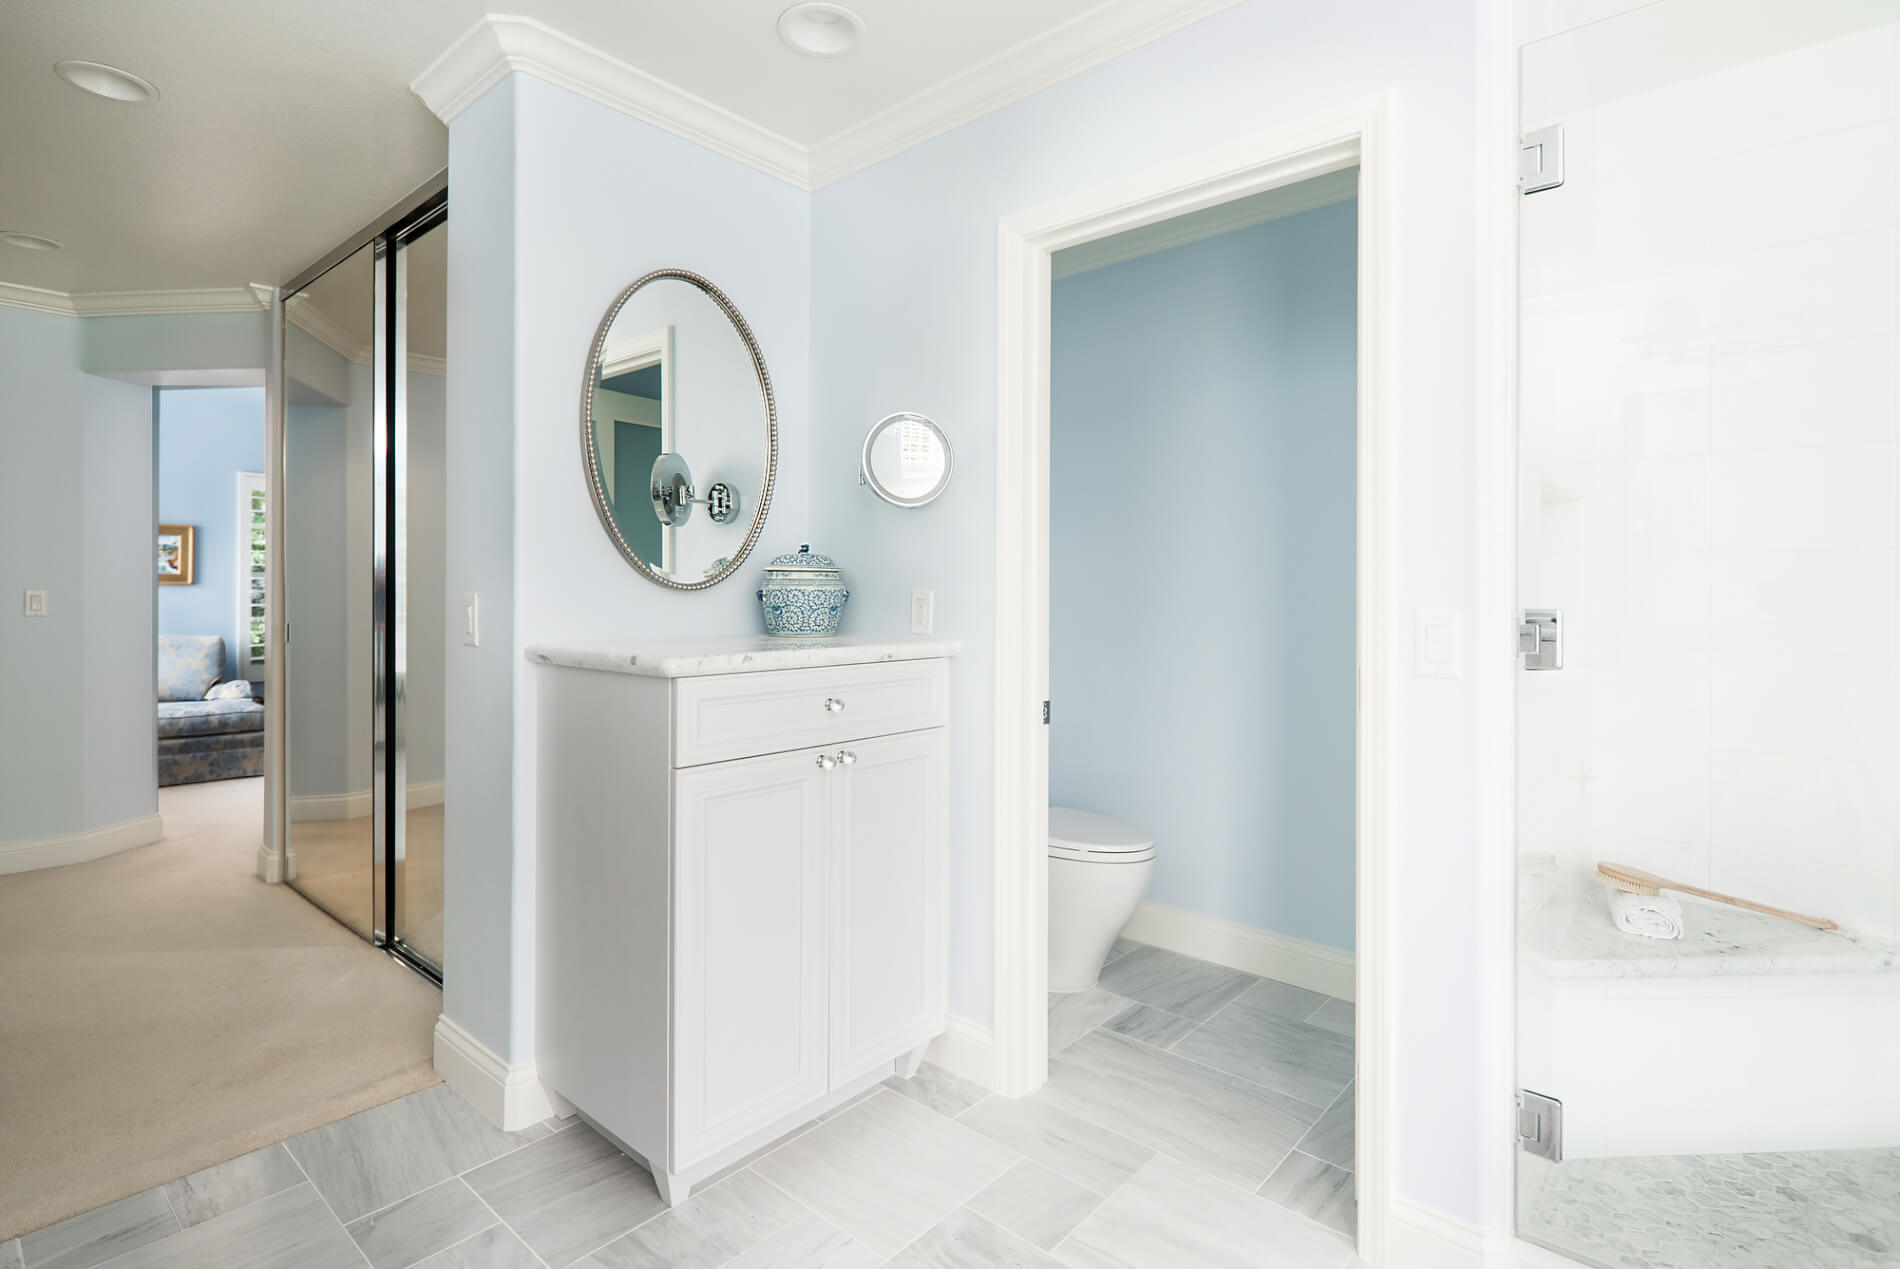 Full Bathroom Remodel, Home Construction Companies, Bathroom Contractors